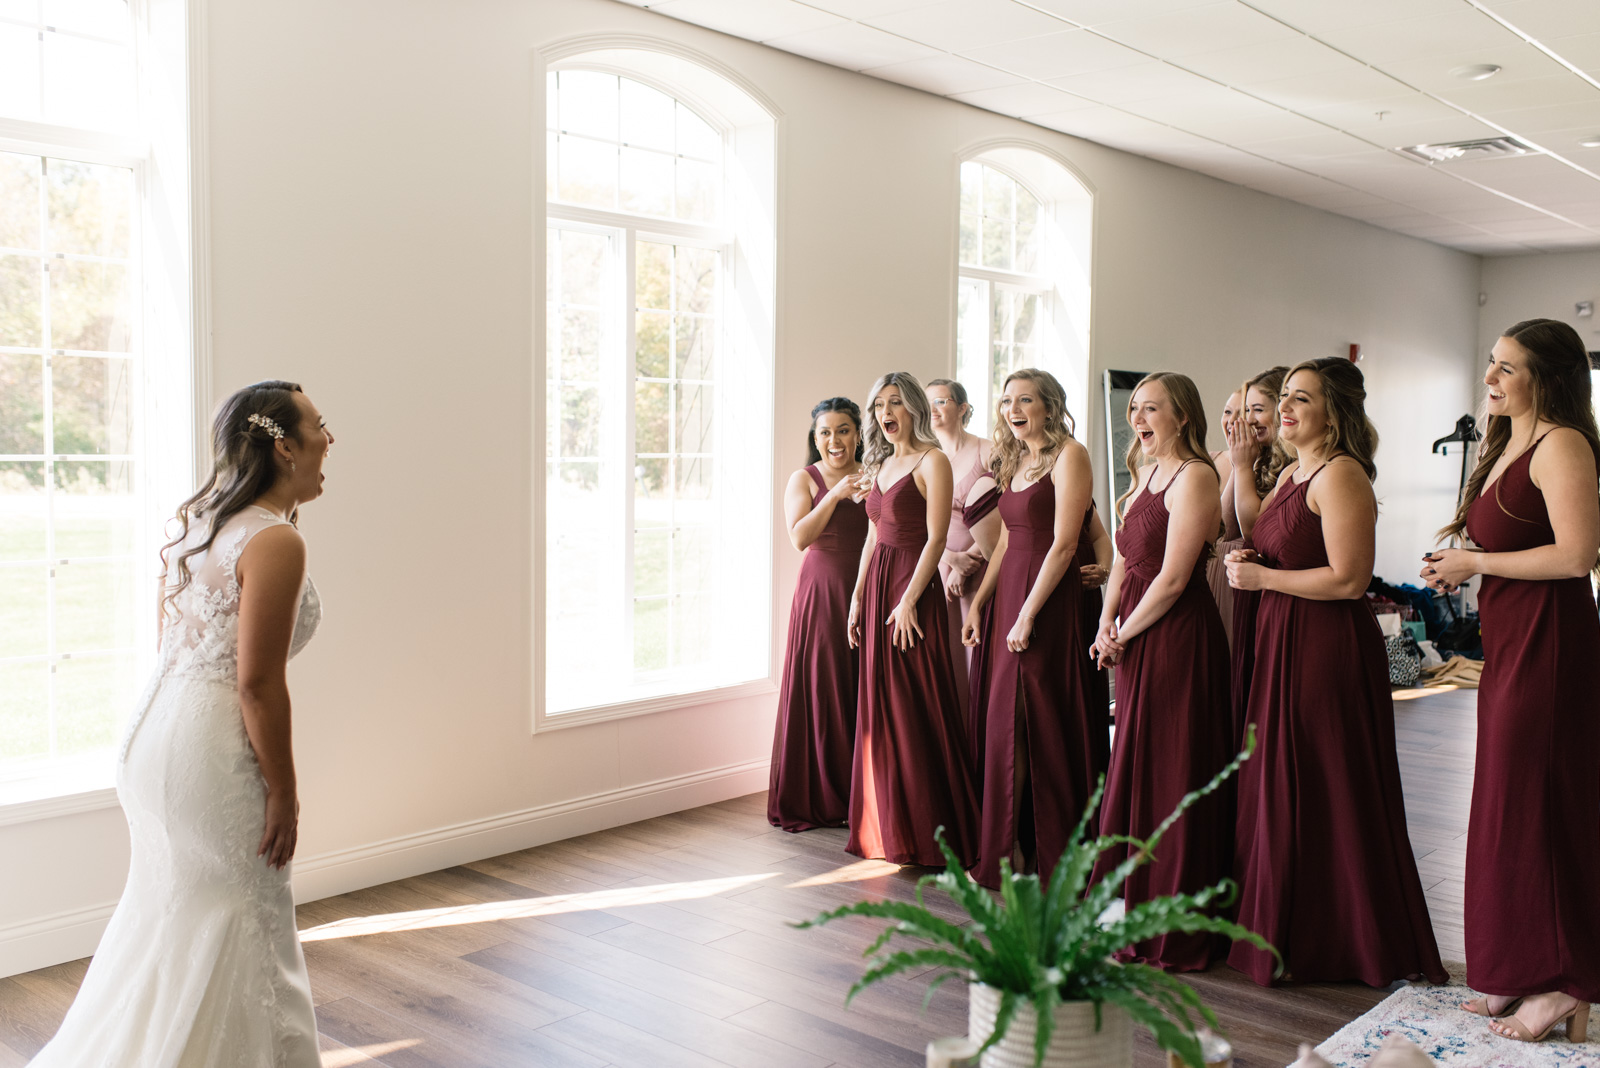 bride revealing wedding dress to bridesmaids during first look bella sala bridal suite